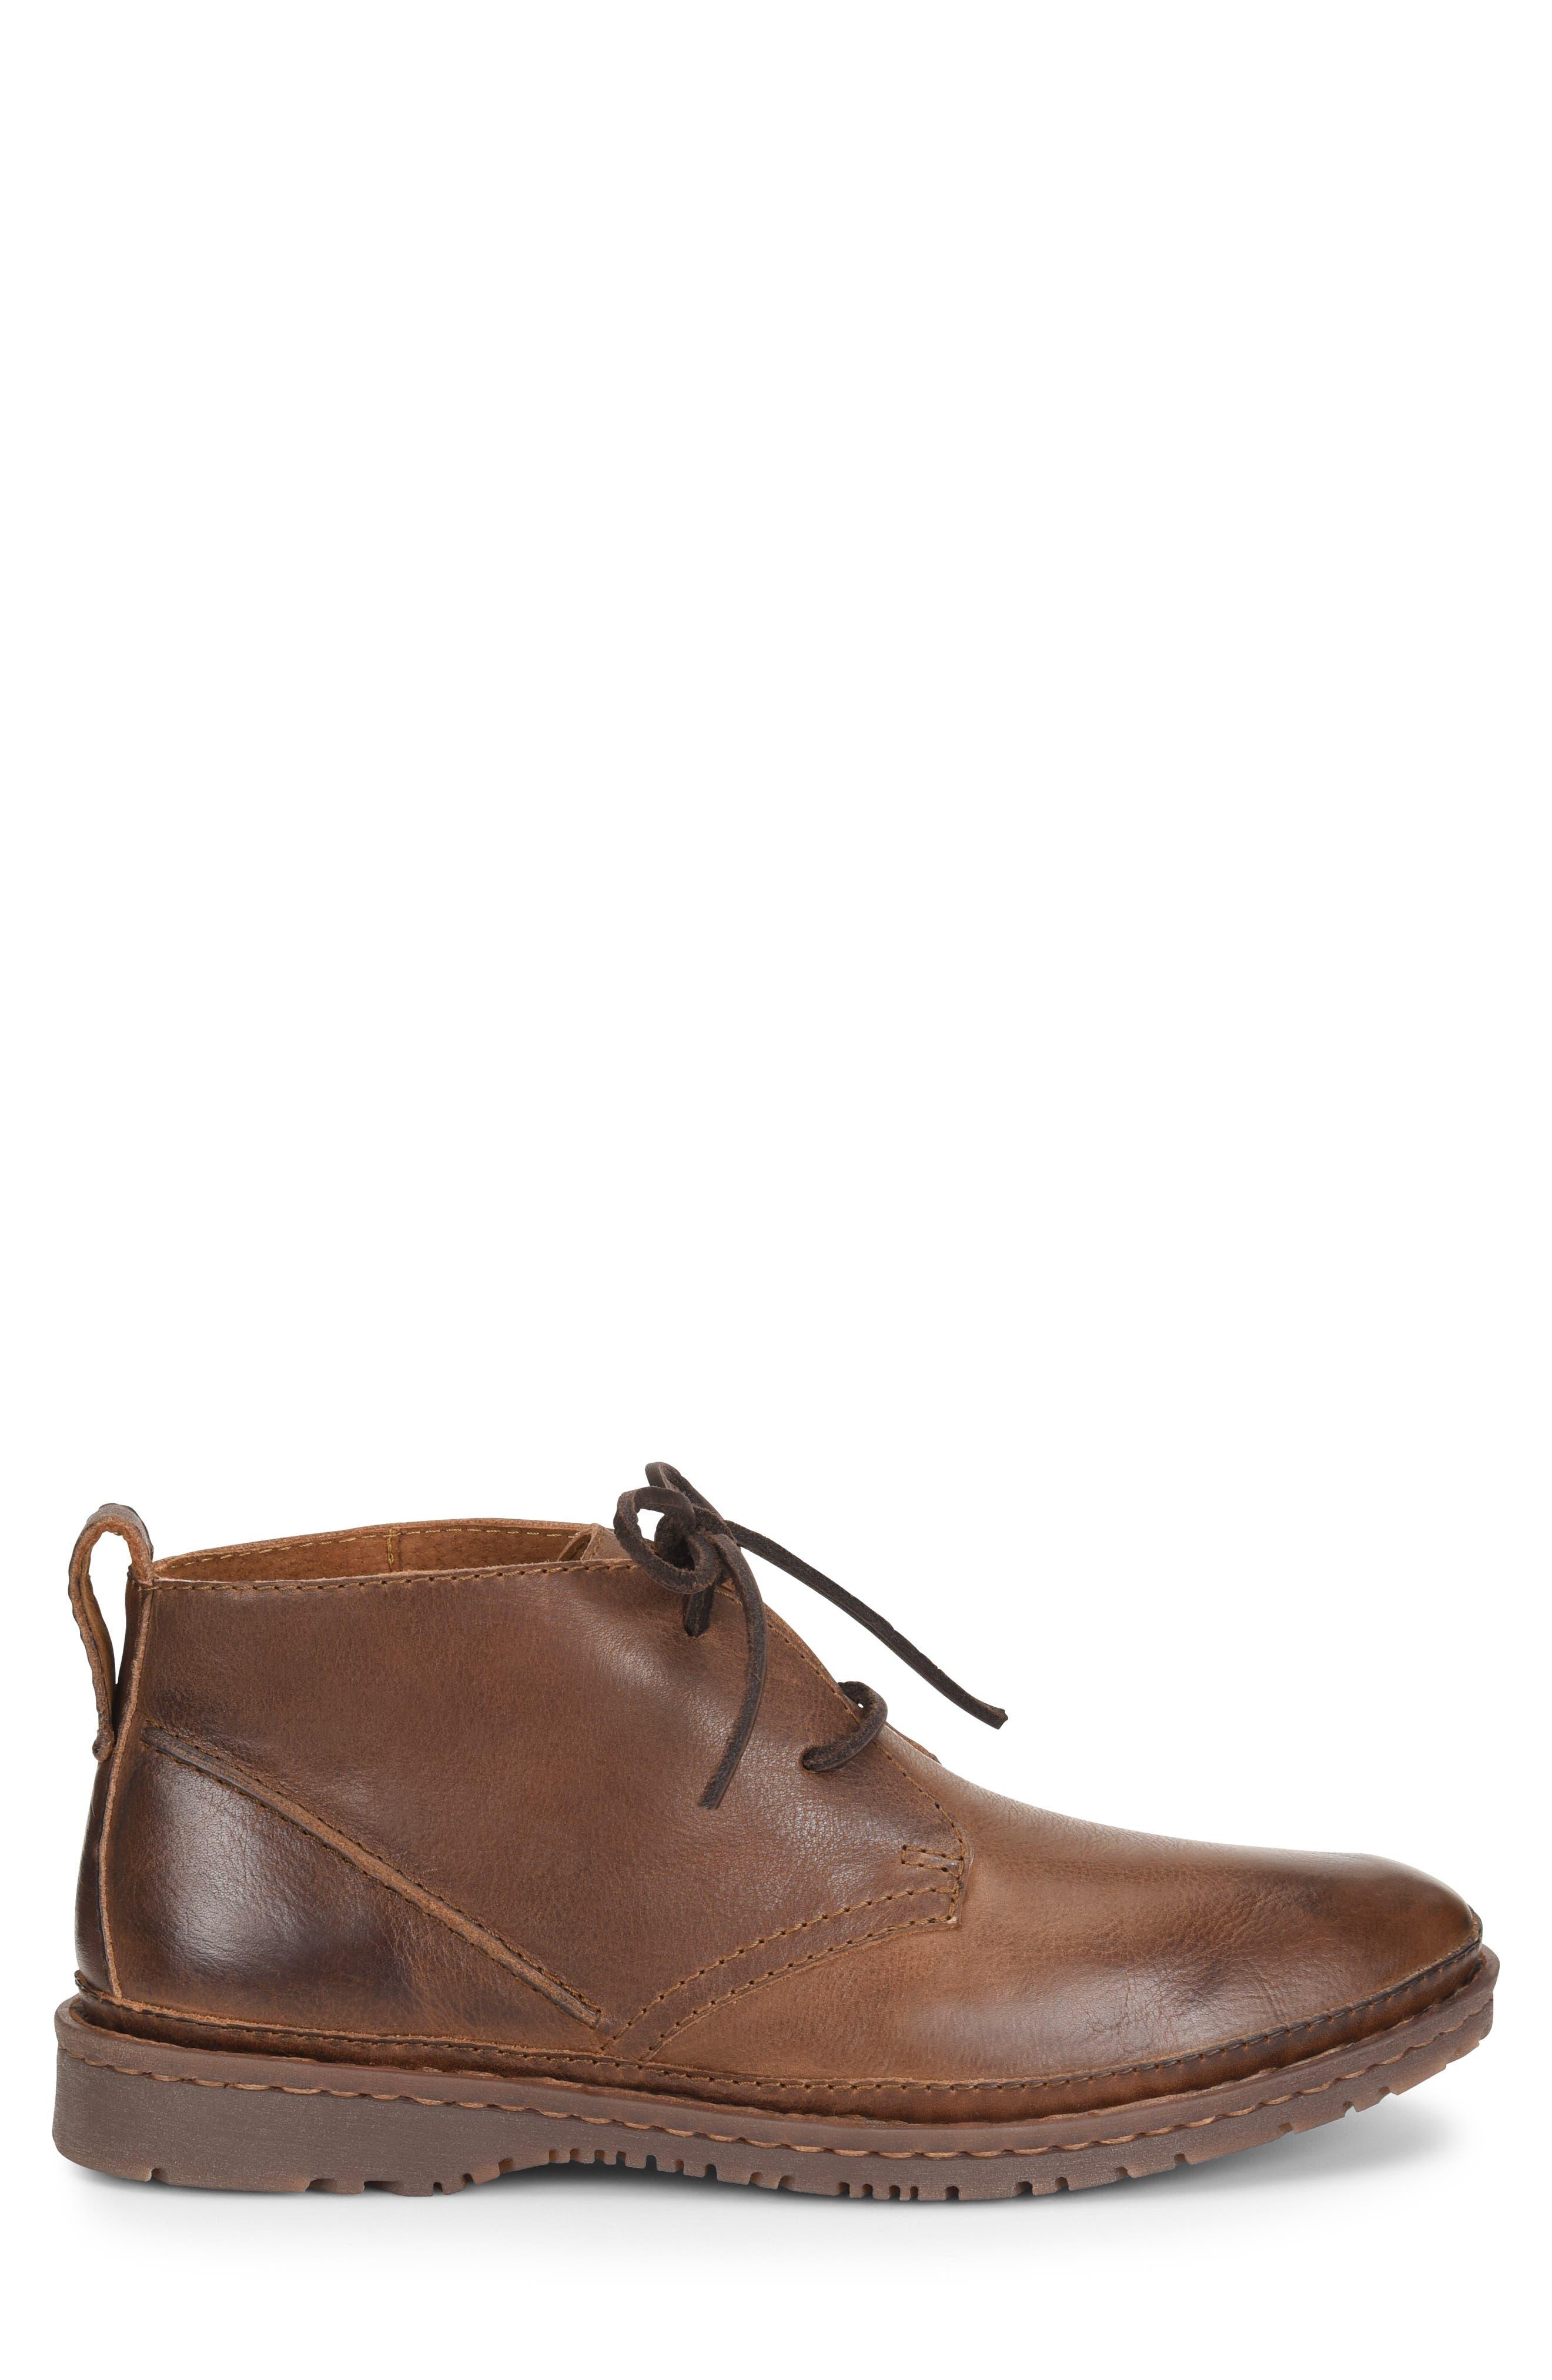 Elk II Chukka Boot,                             Alternate thumbnail 3, color,                             BROWN/BROWN LEATHER